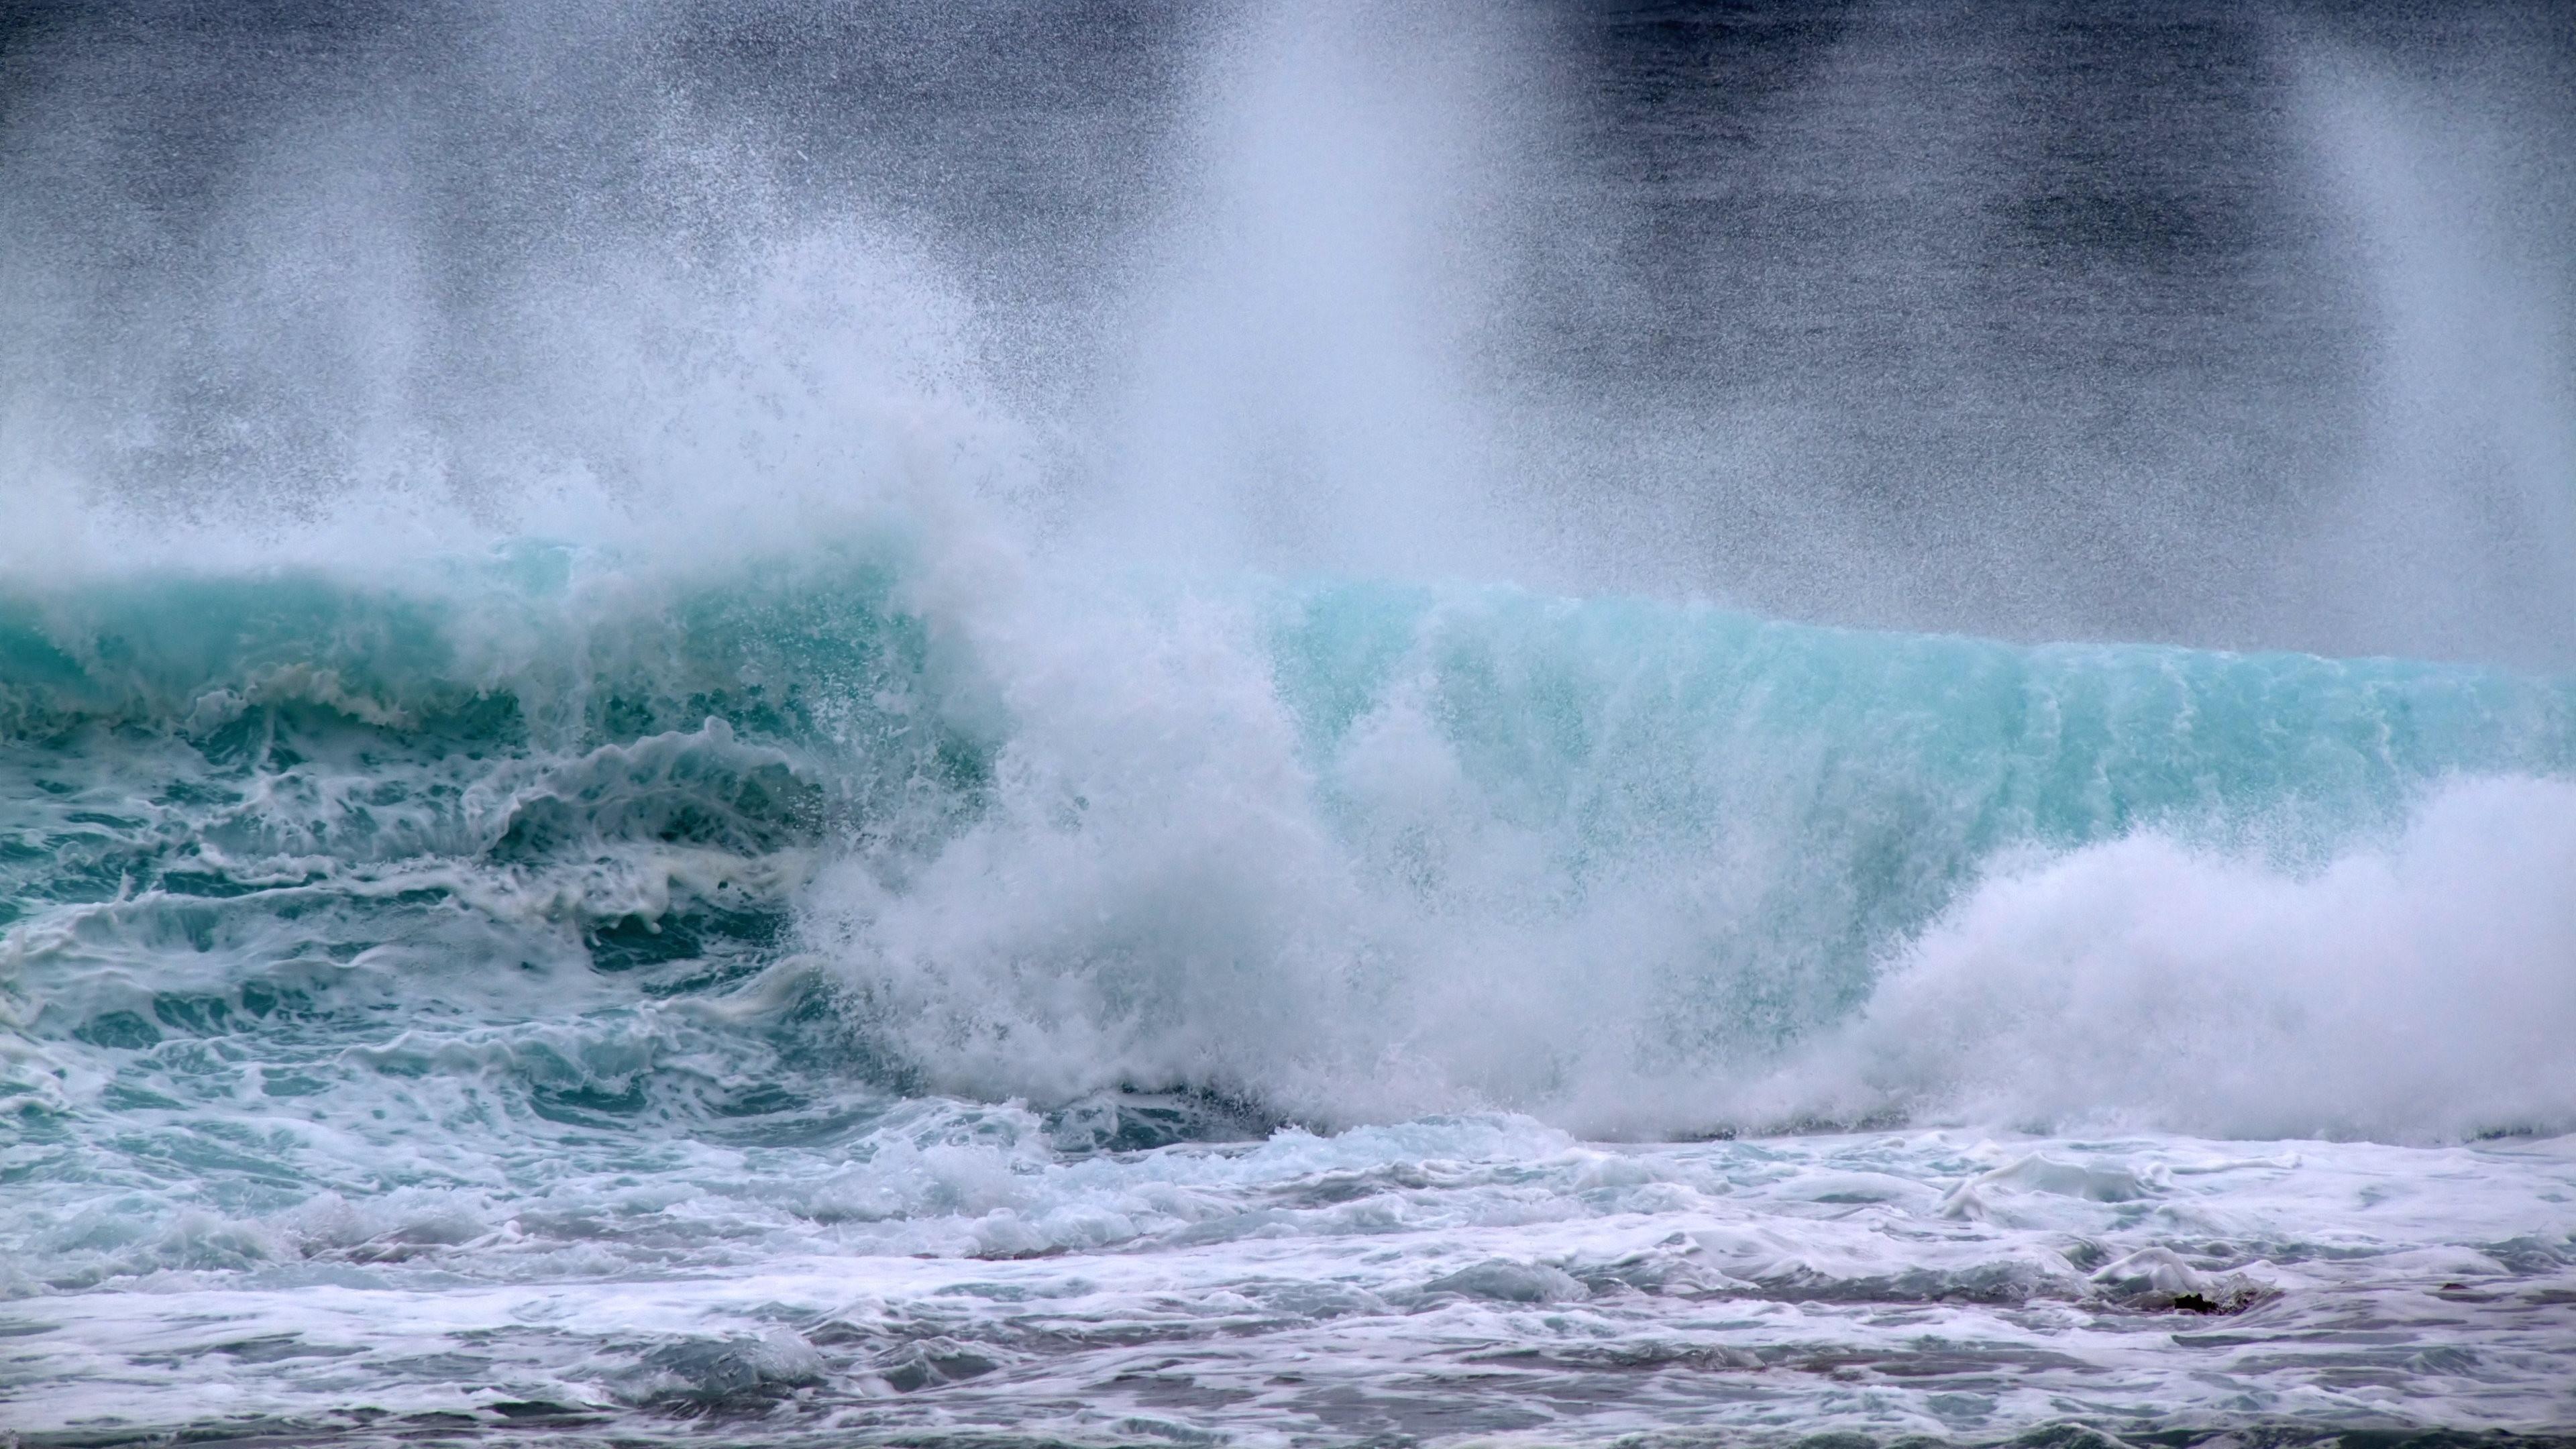 4K HD Wallpaper: Ocean Waves – Madliena, Malta Majjistral, MT